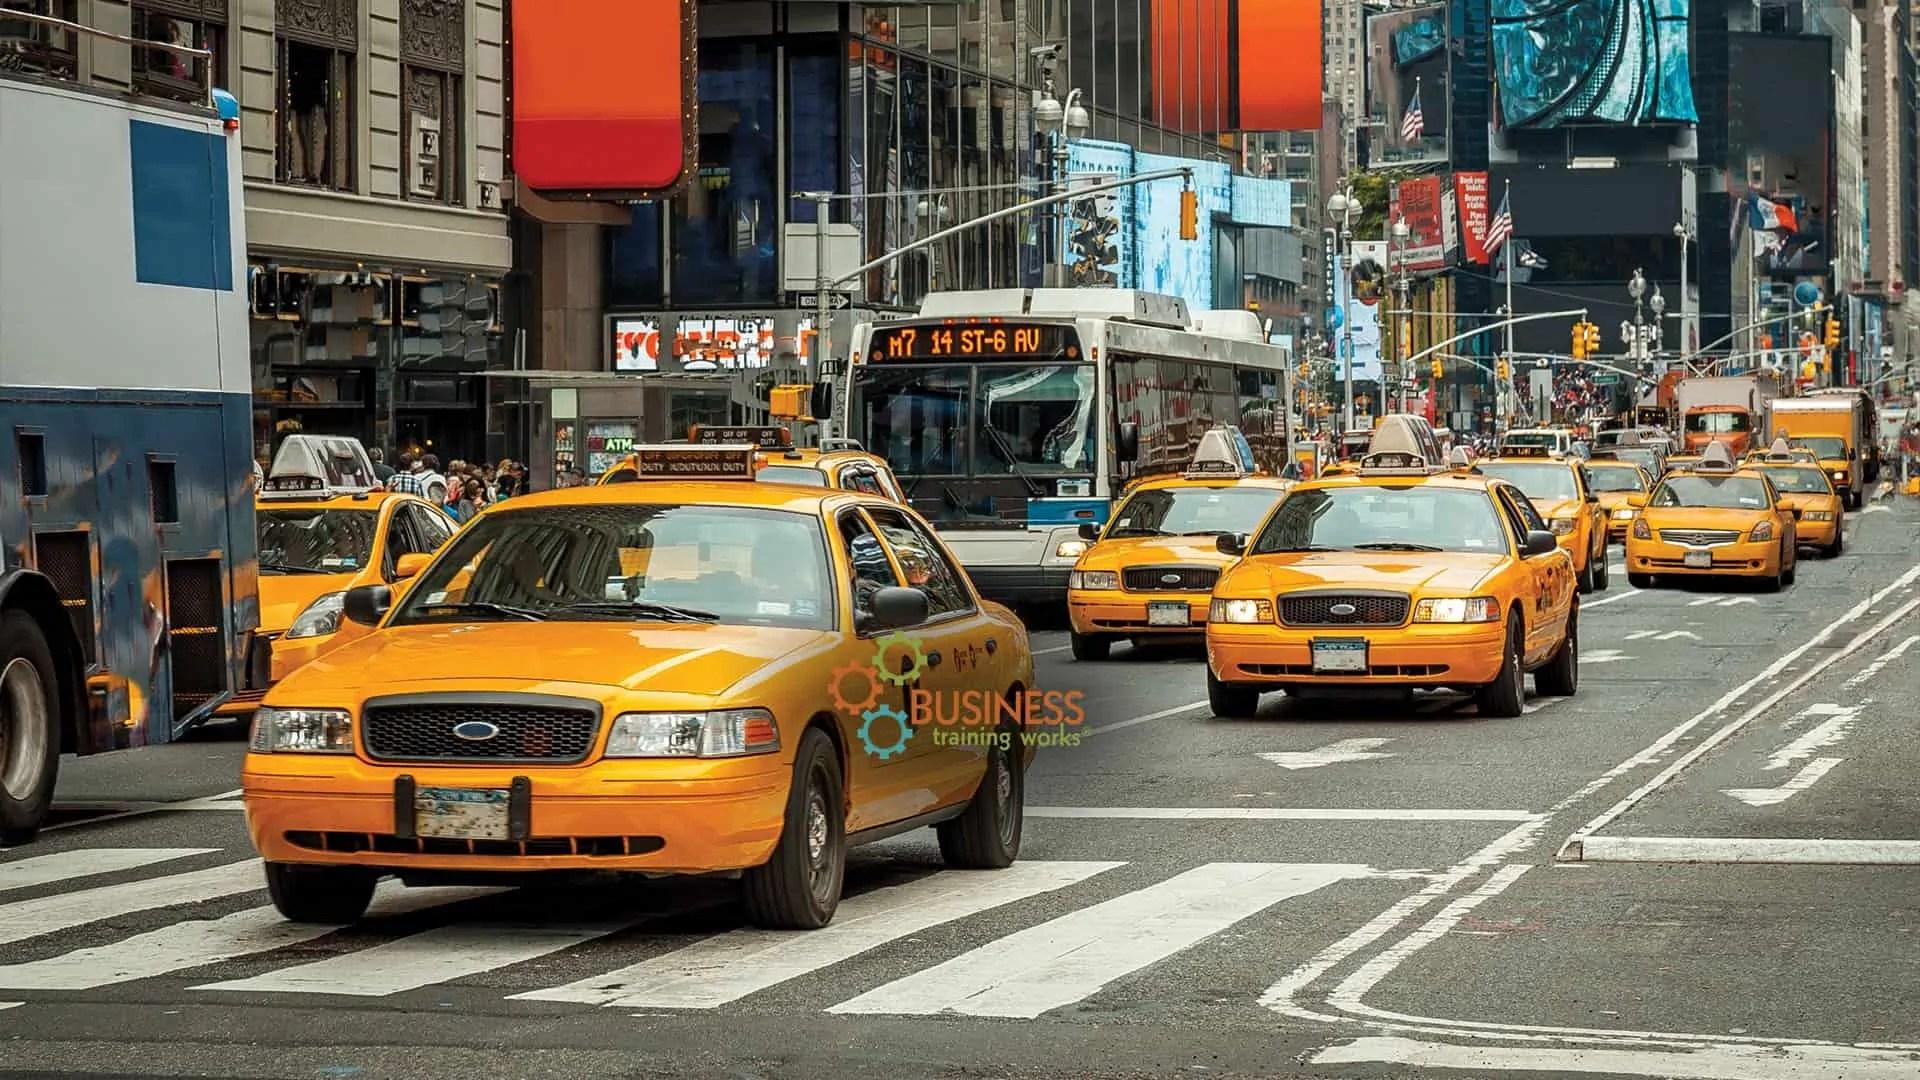 Onsite Training in New York